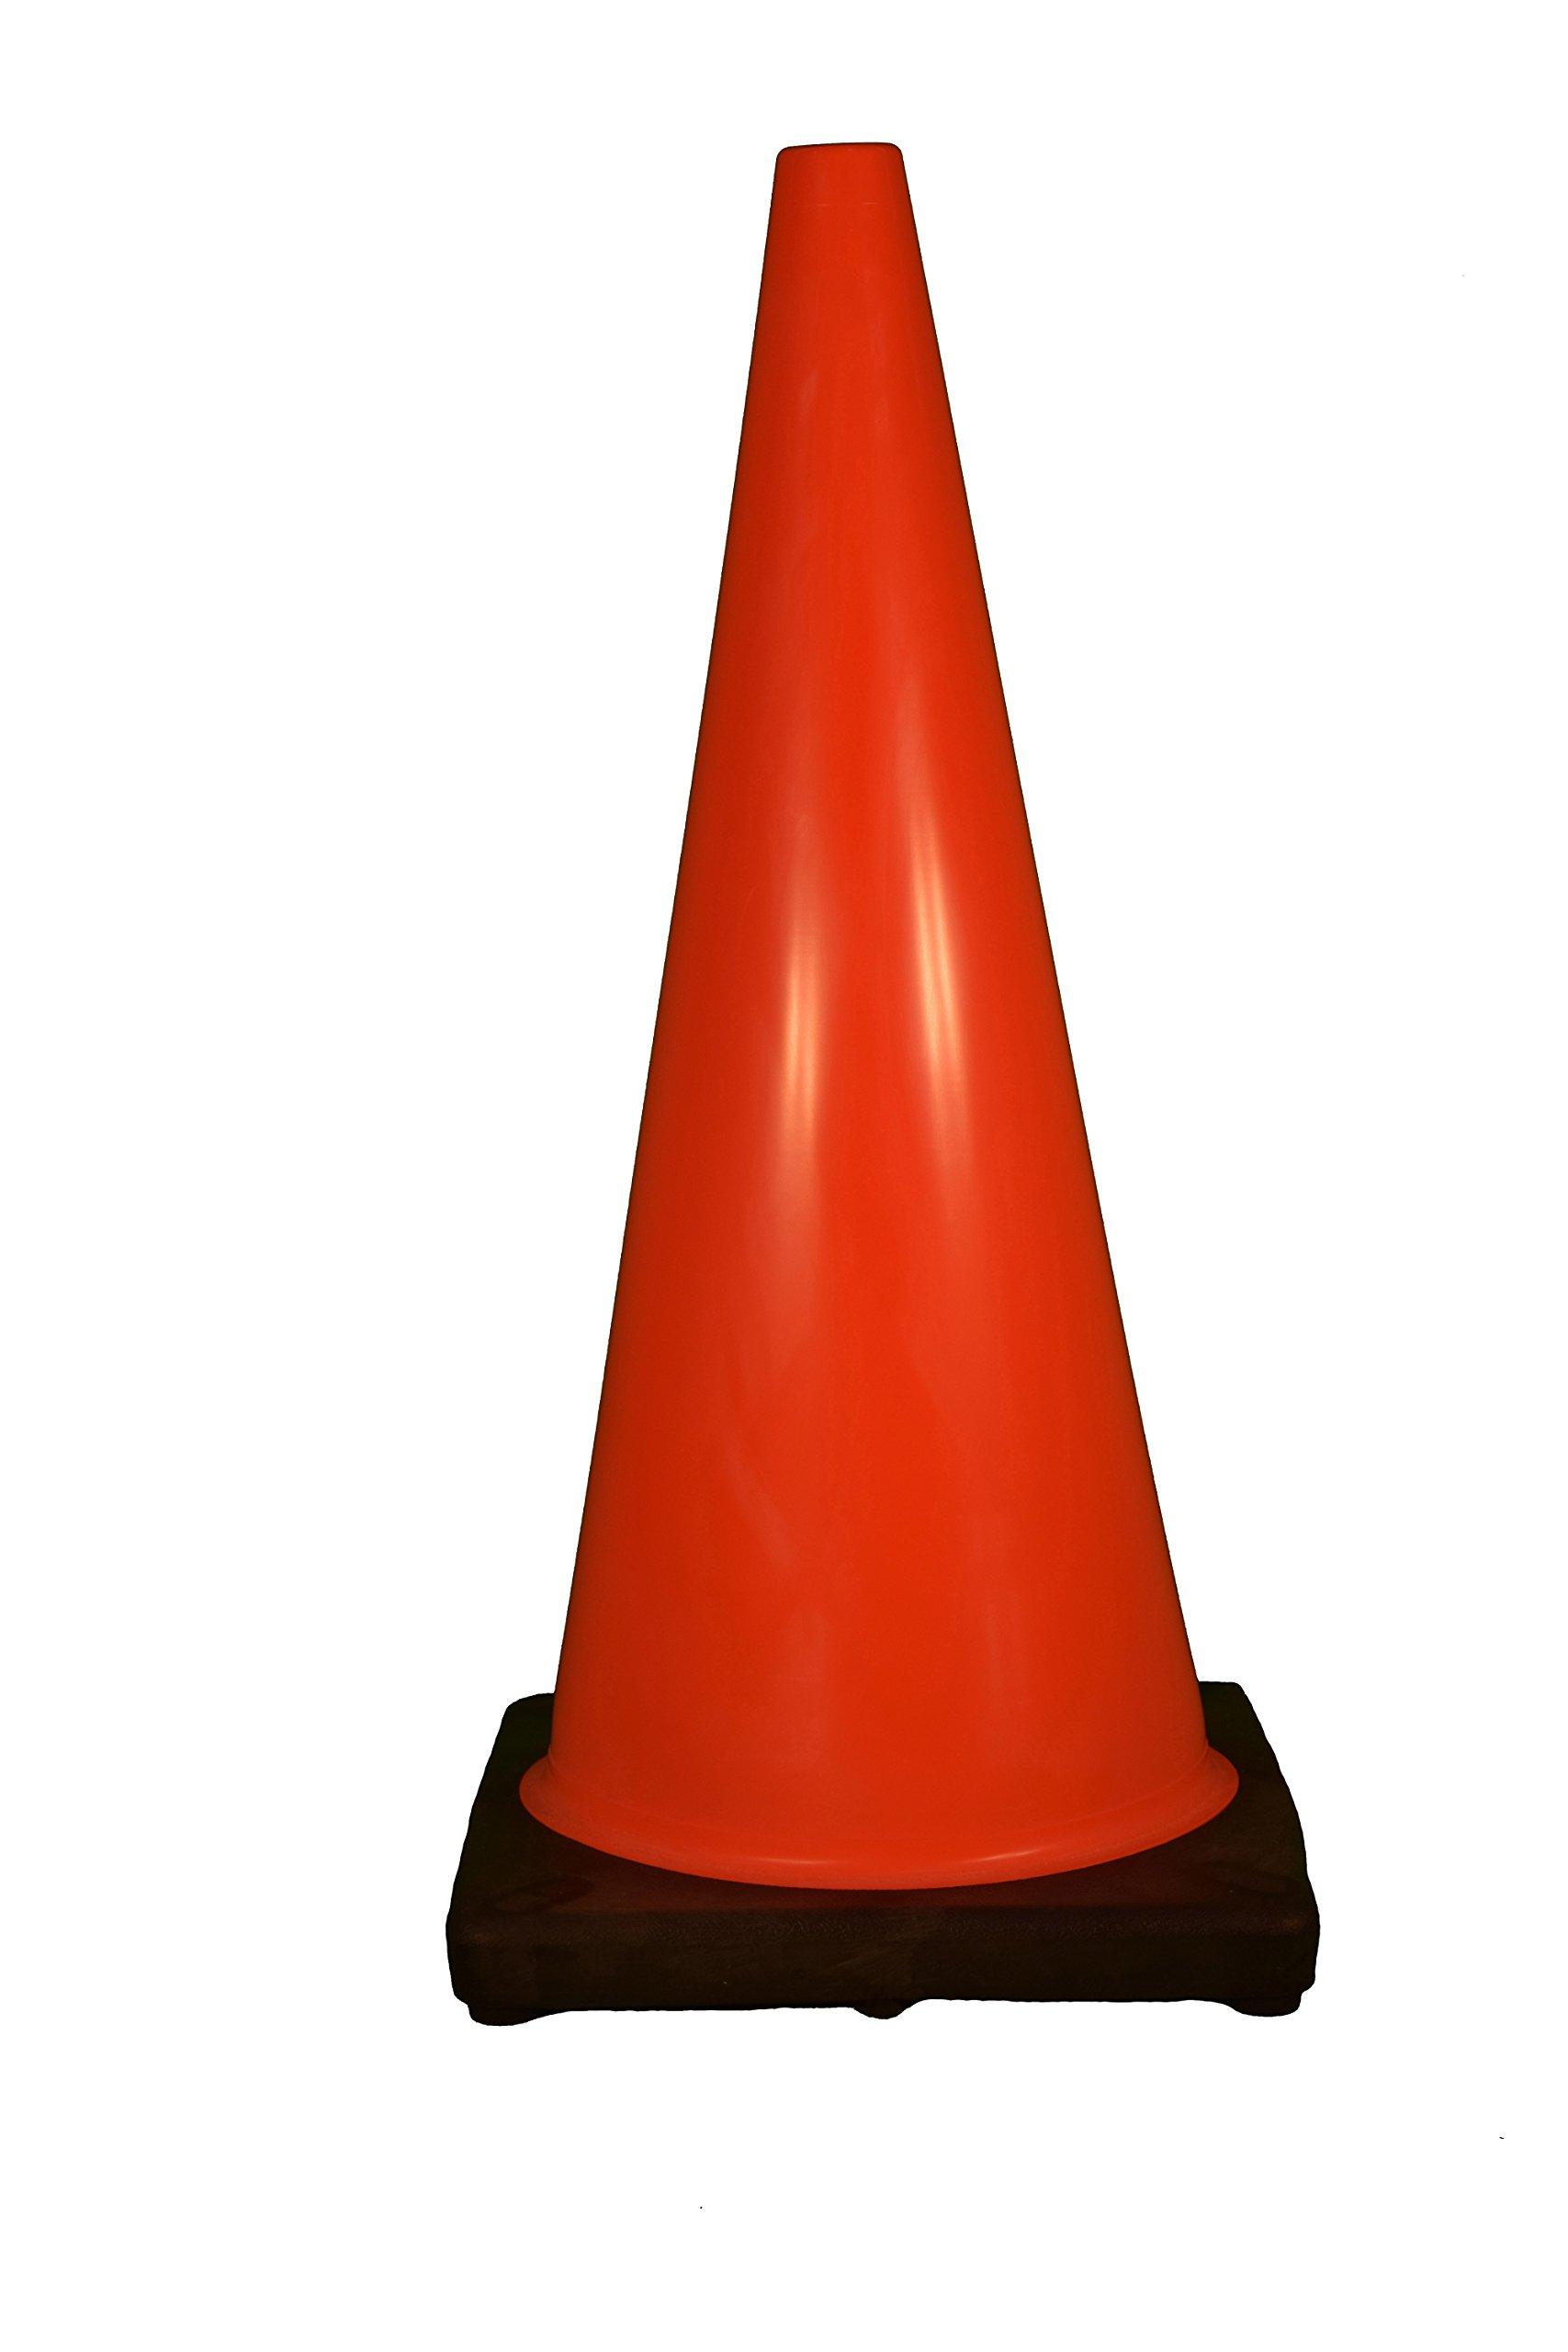 Cortina 03-500-07 Vinyl Traffic Cone with Black Base, 28'' Height, Red/Orange